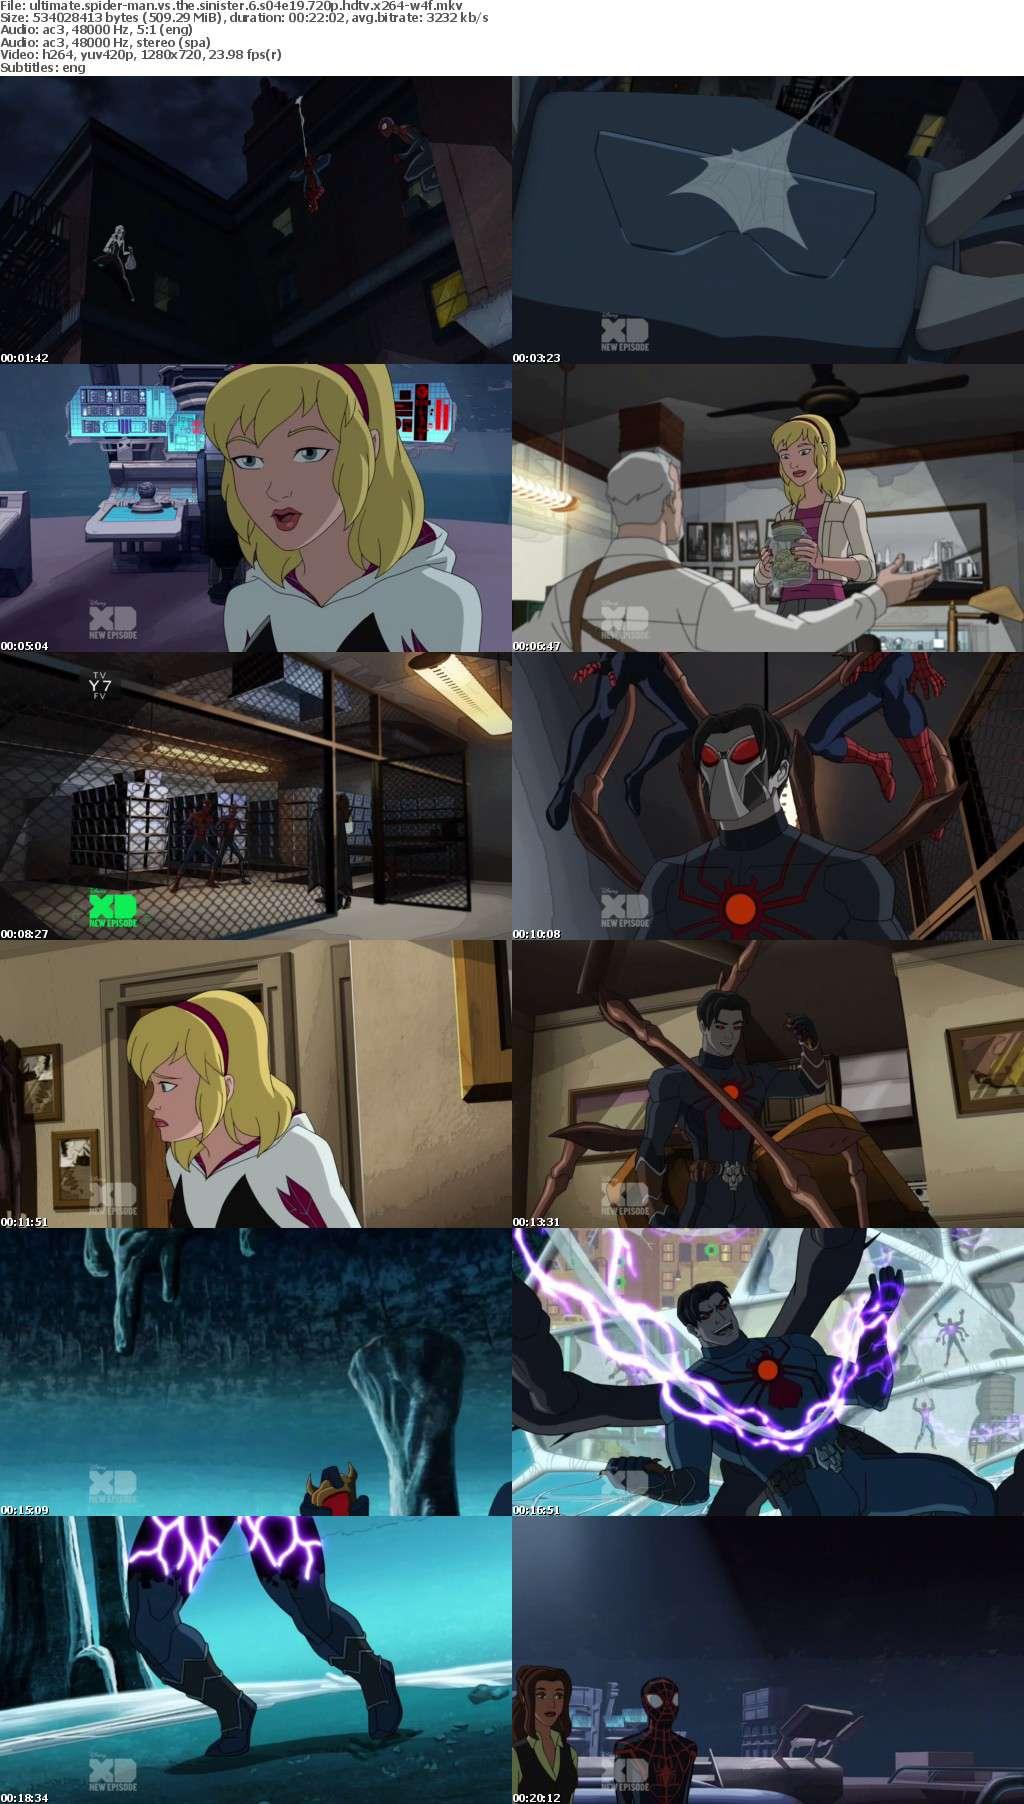 Ultimate Spider-Man vs the Sinister 6 S04E19 720p HDTV x264-W4F